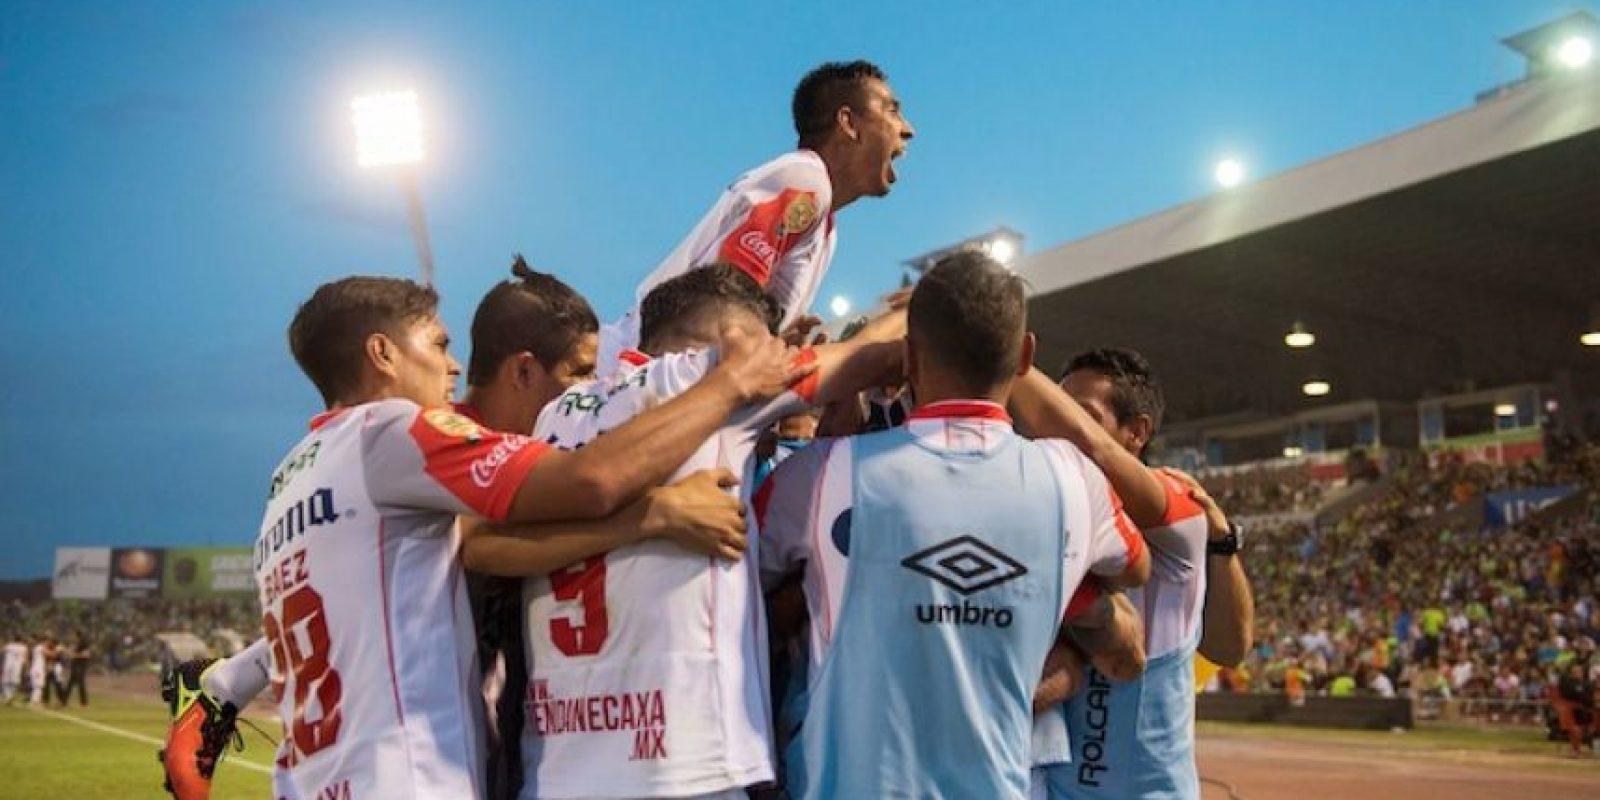 Necaxa derrotó por global de 3-0 a Juárez. Foto:Mexsport